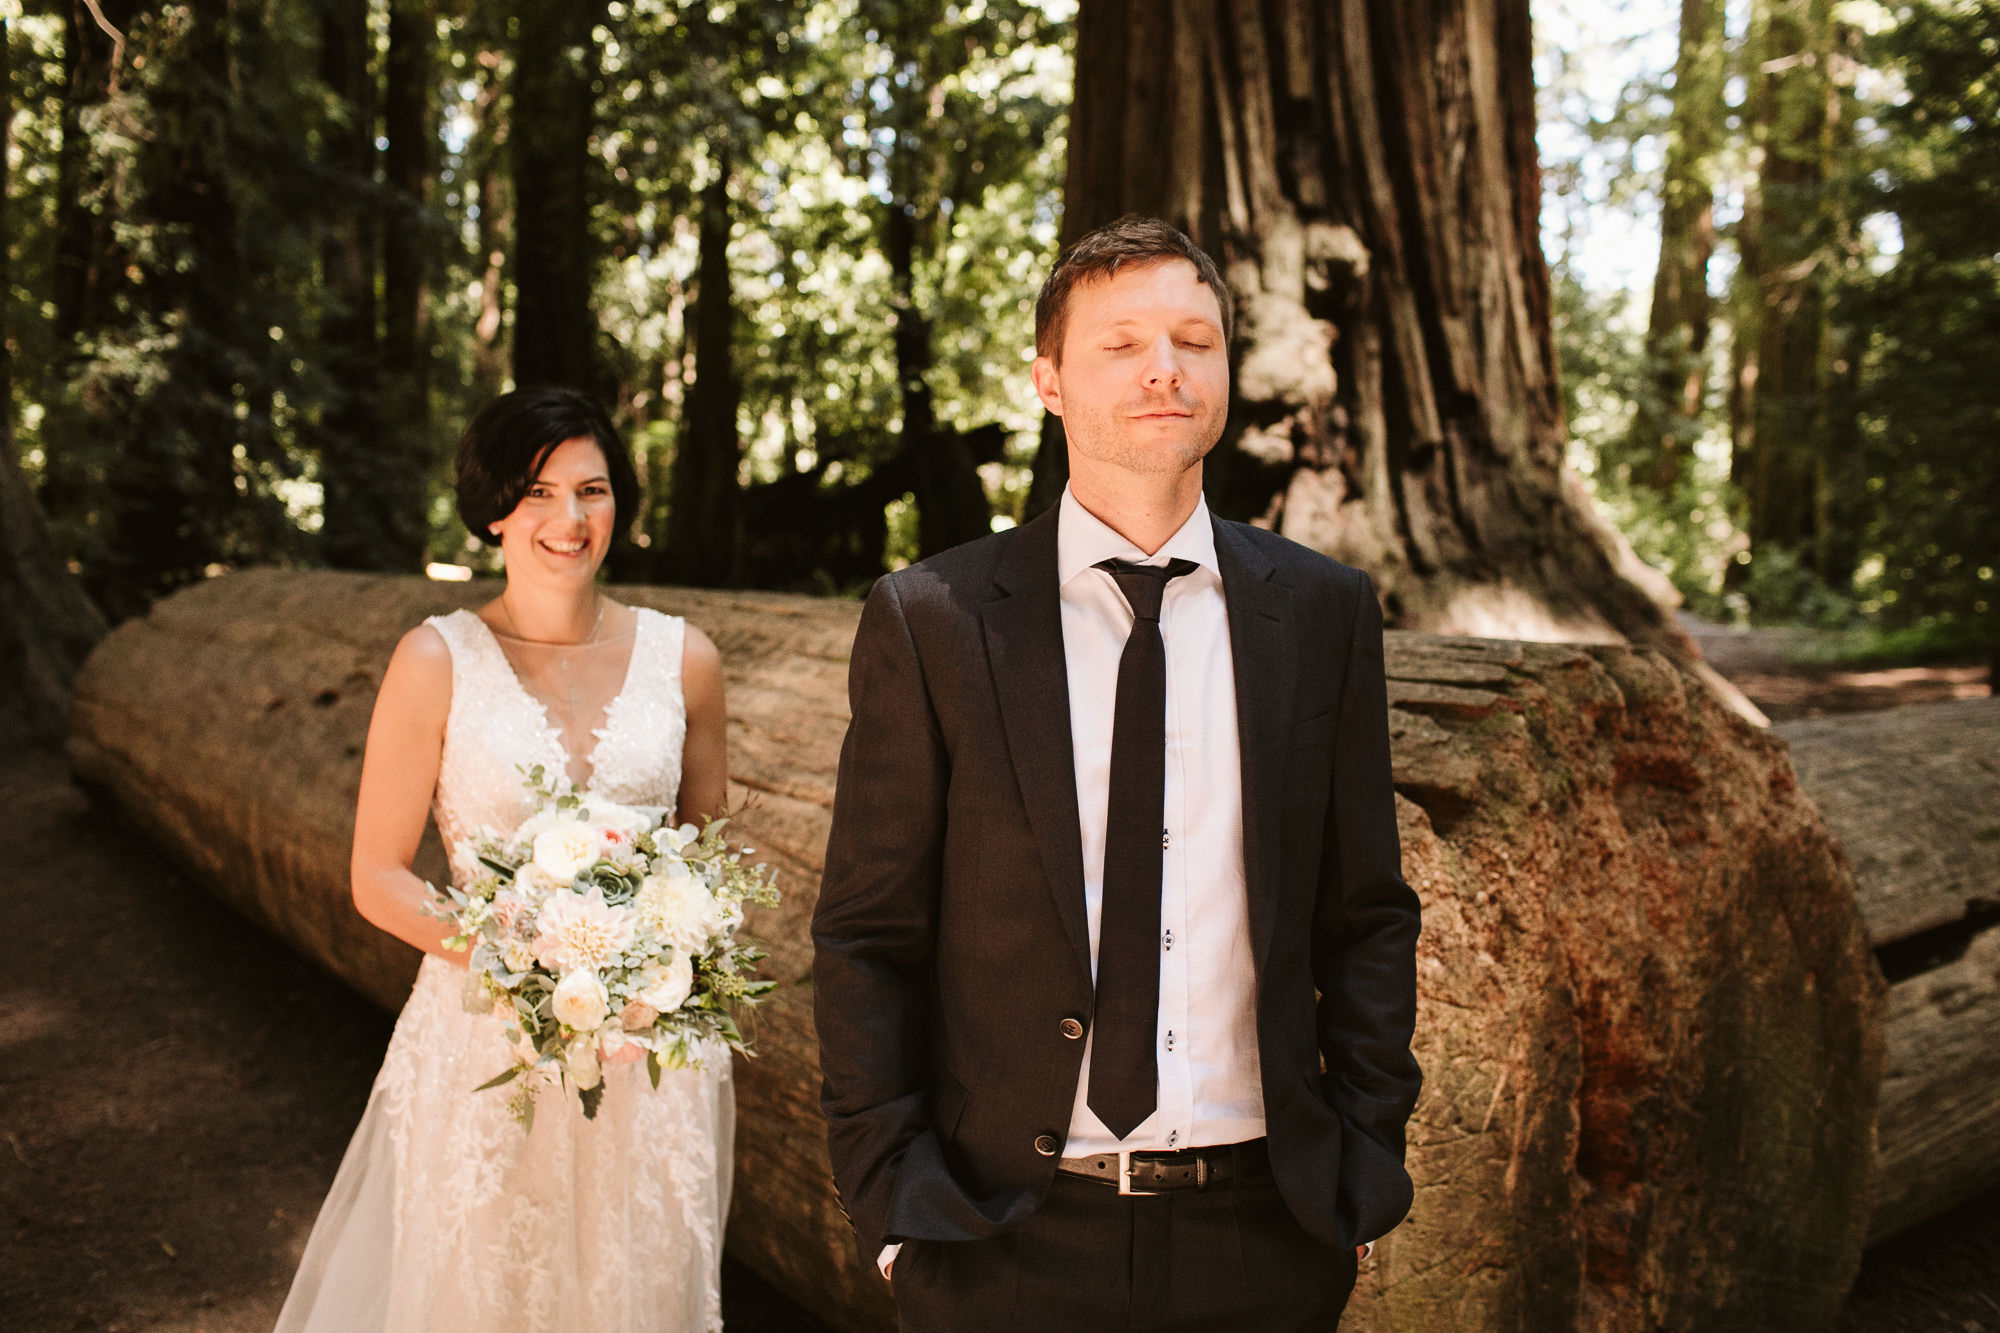 California-wedding-photographer-alfonso-flores-pamplin-groove-155.jpg